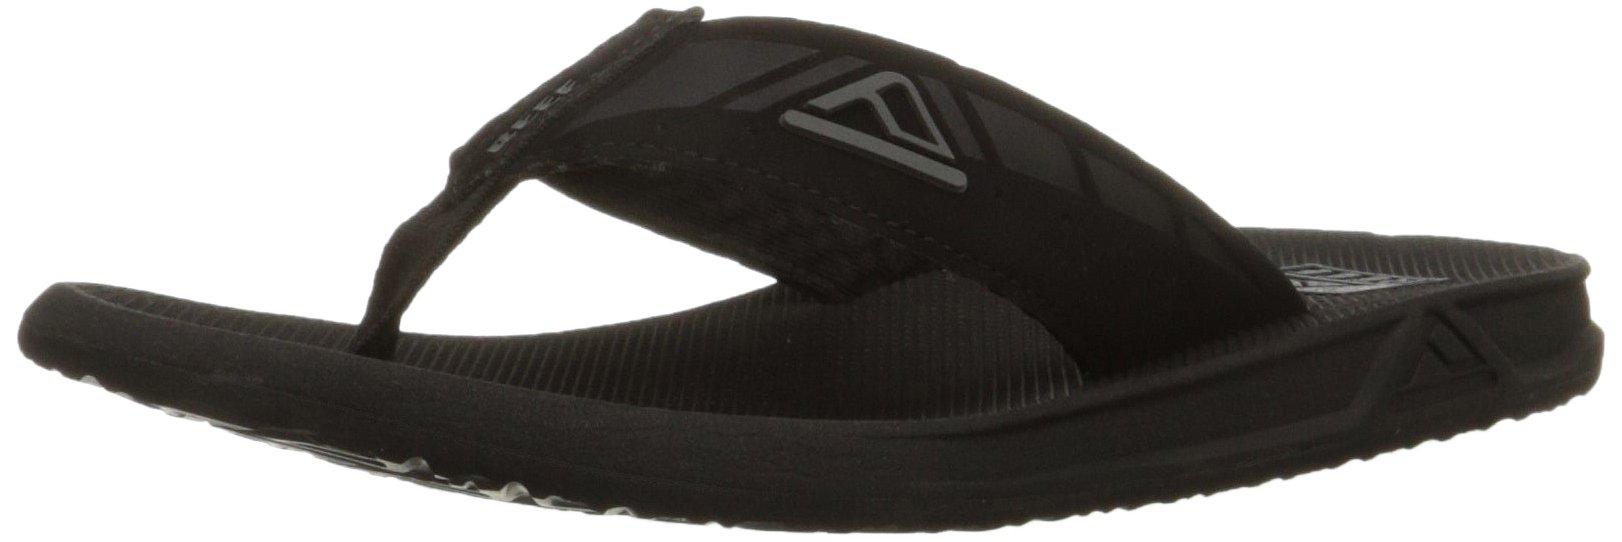 Reef Men's Phantom Sandal, Black, 14 M US